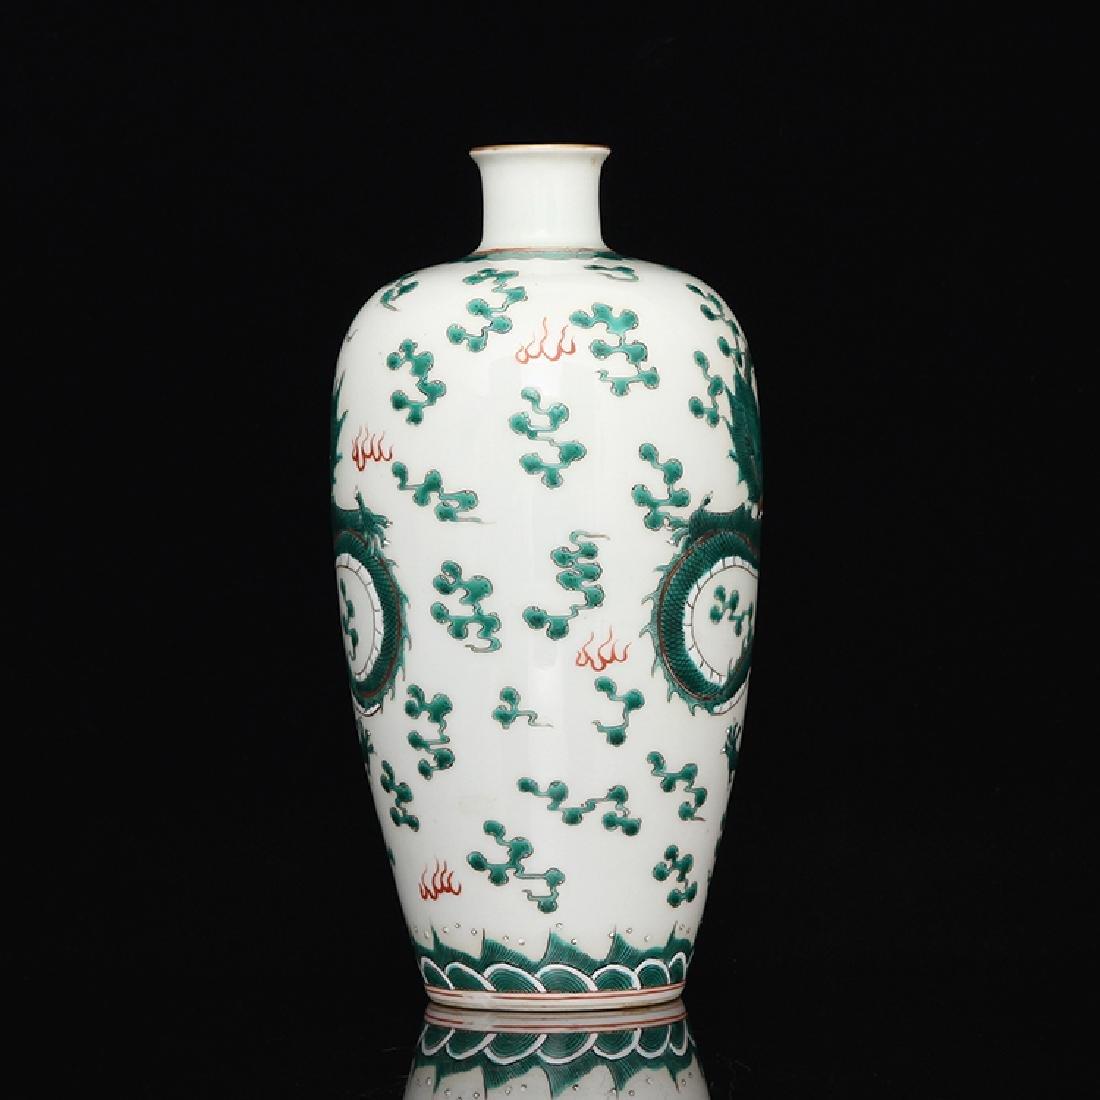 Chinese White Glaze Green Dragon Porcelain  Vase - 7